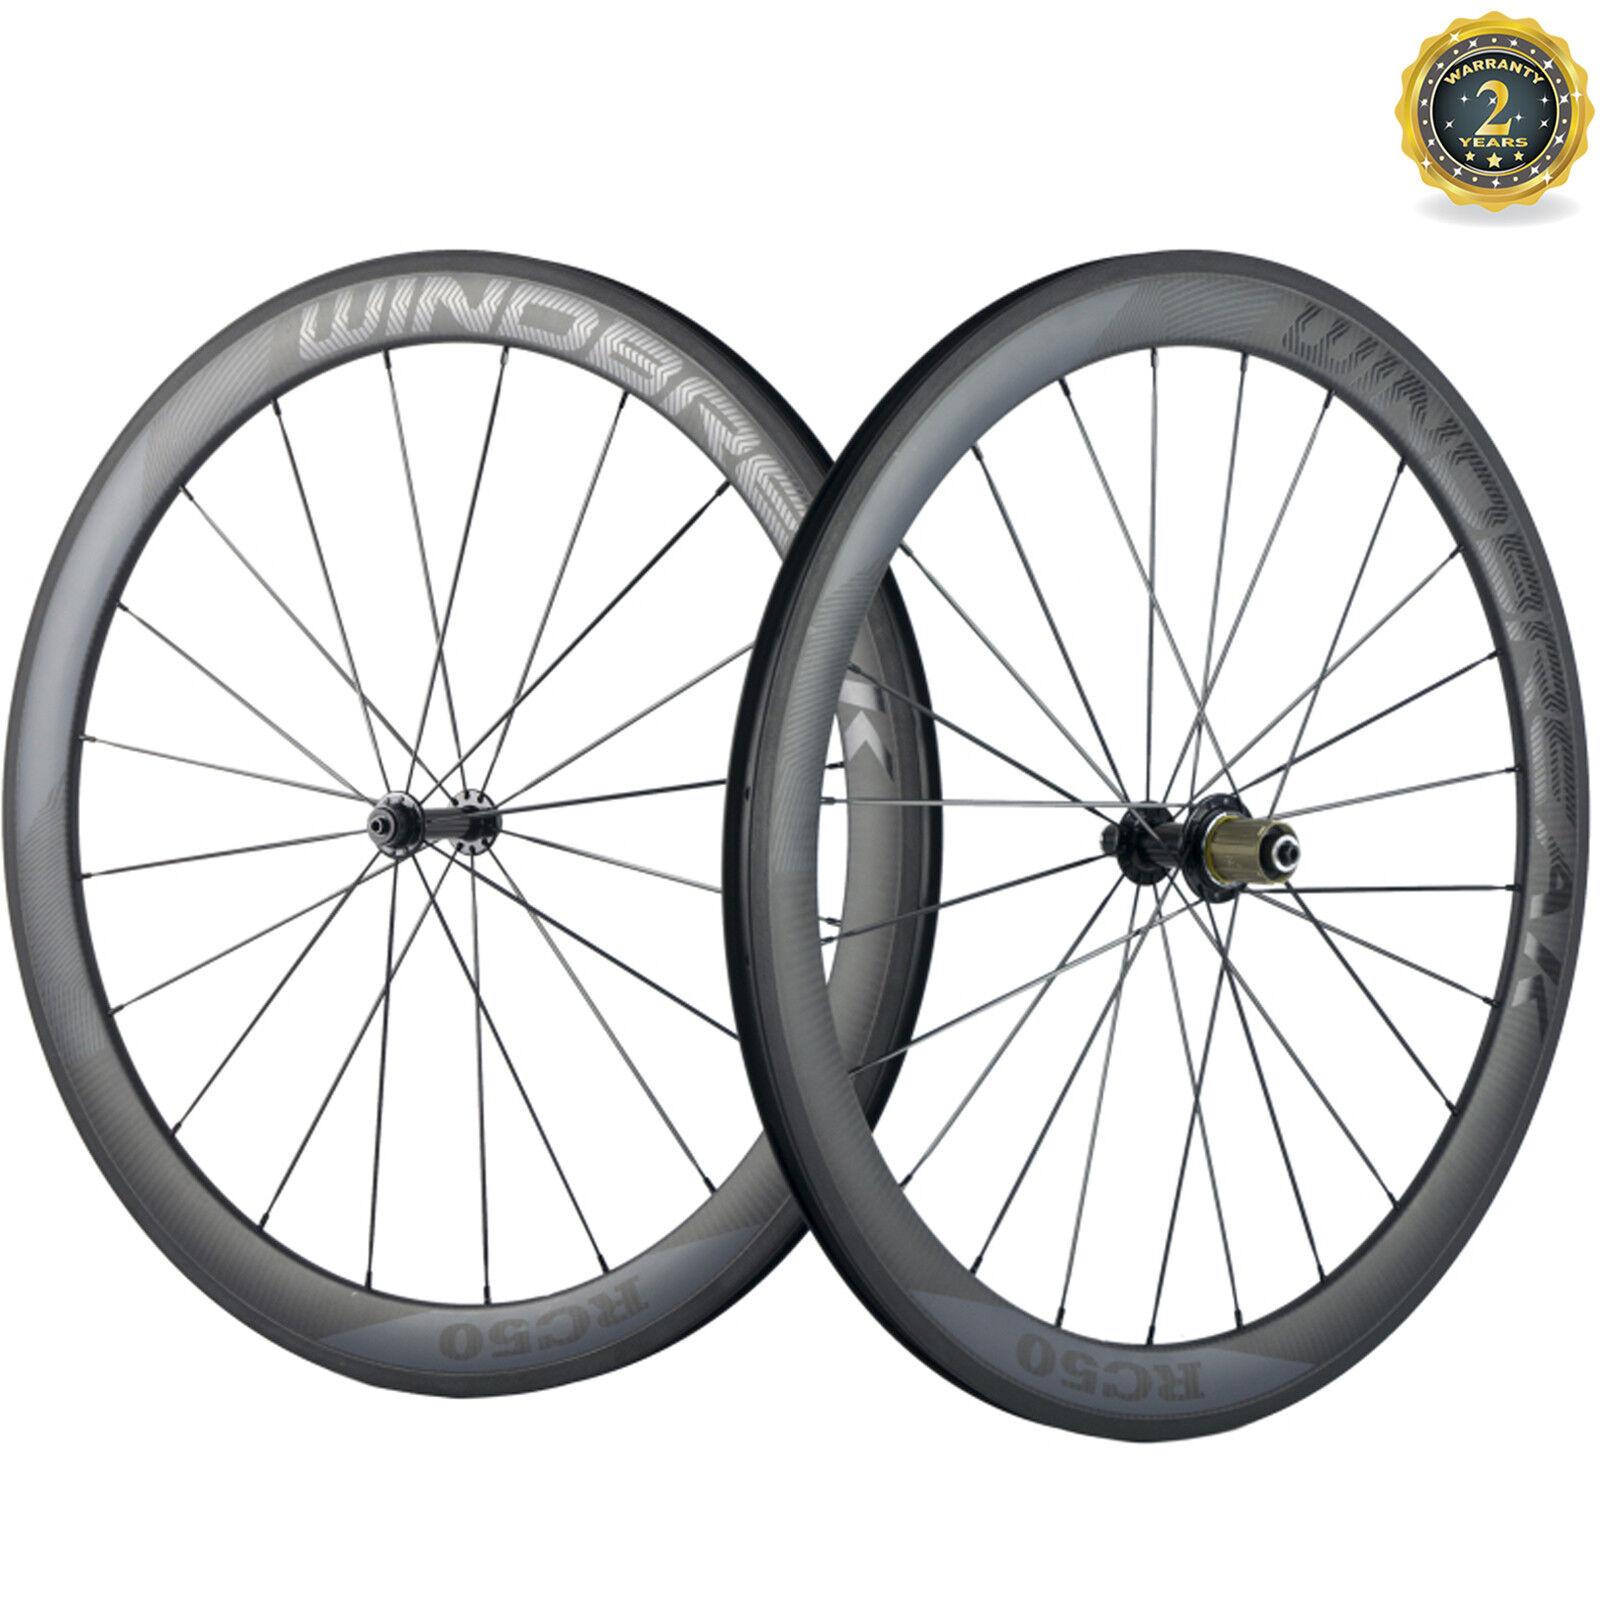 WINDBREAK Transparent Decal 50MM Clincher Carbon Wheelset Road Bike Cycle Wheels